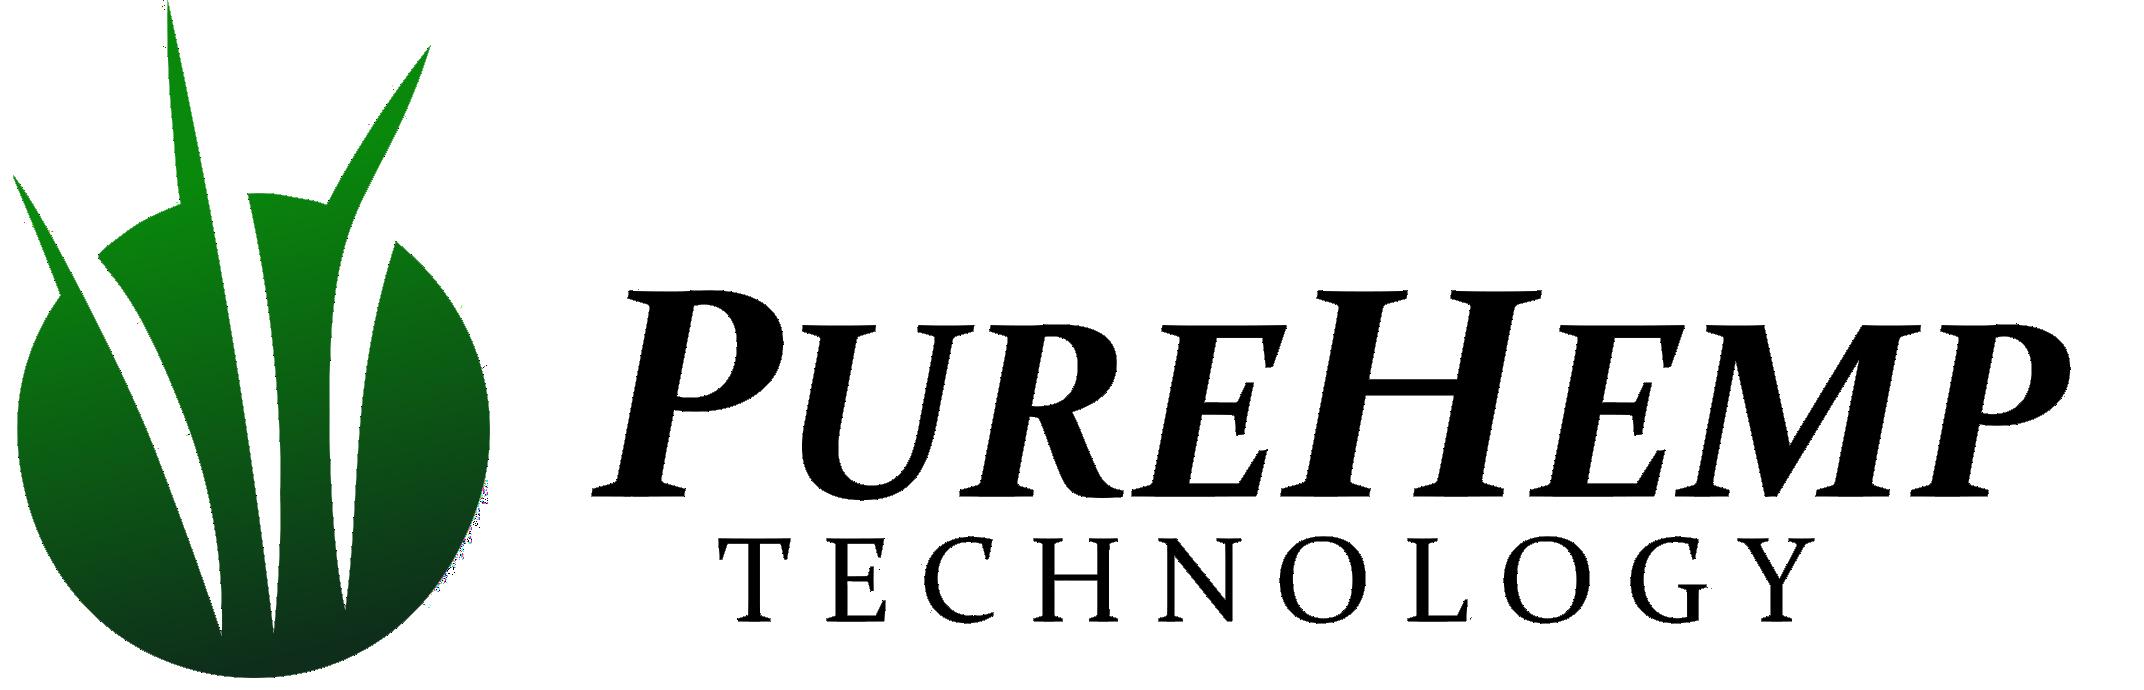 Purehemp logo FULL.png